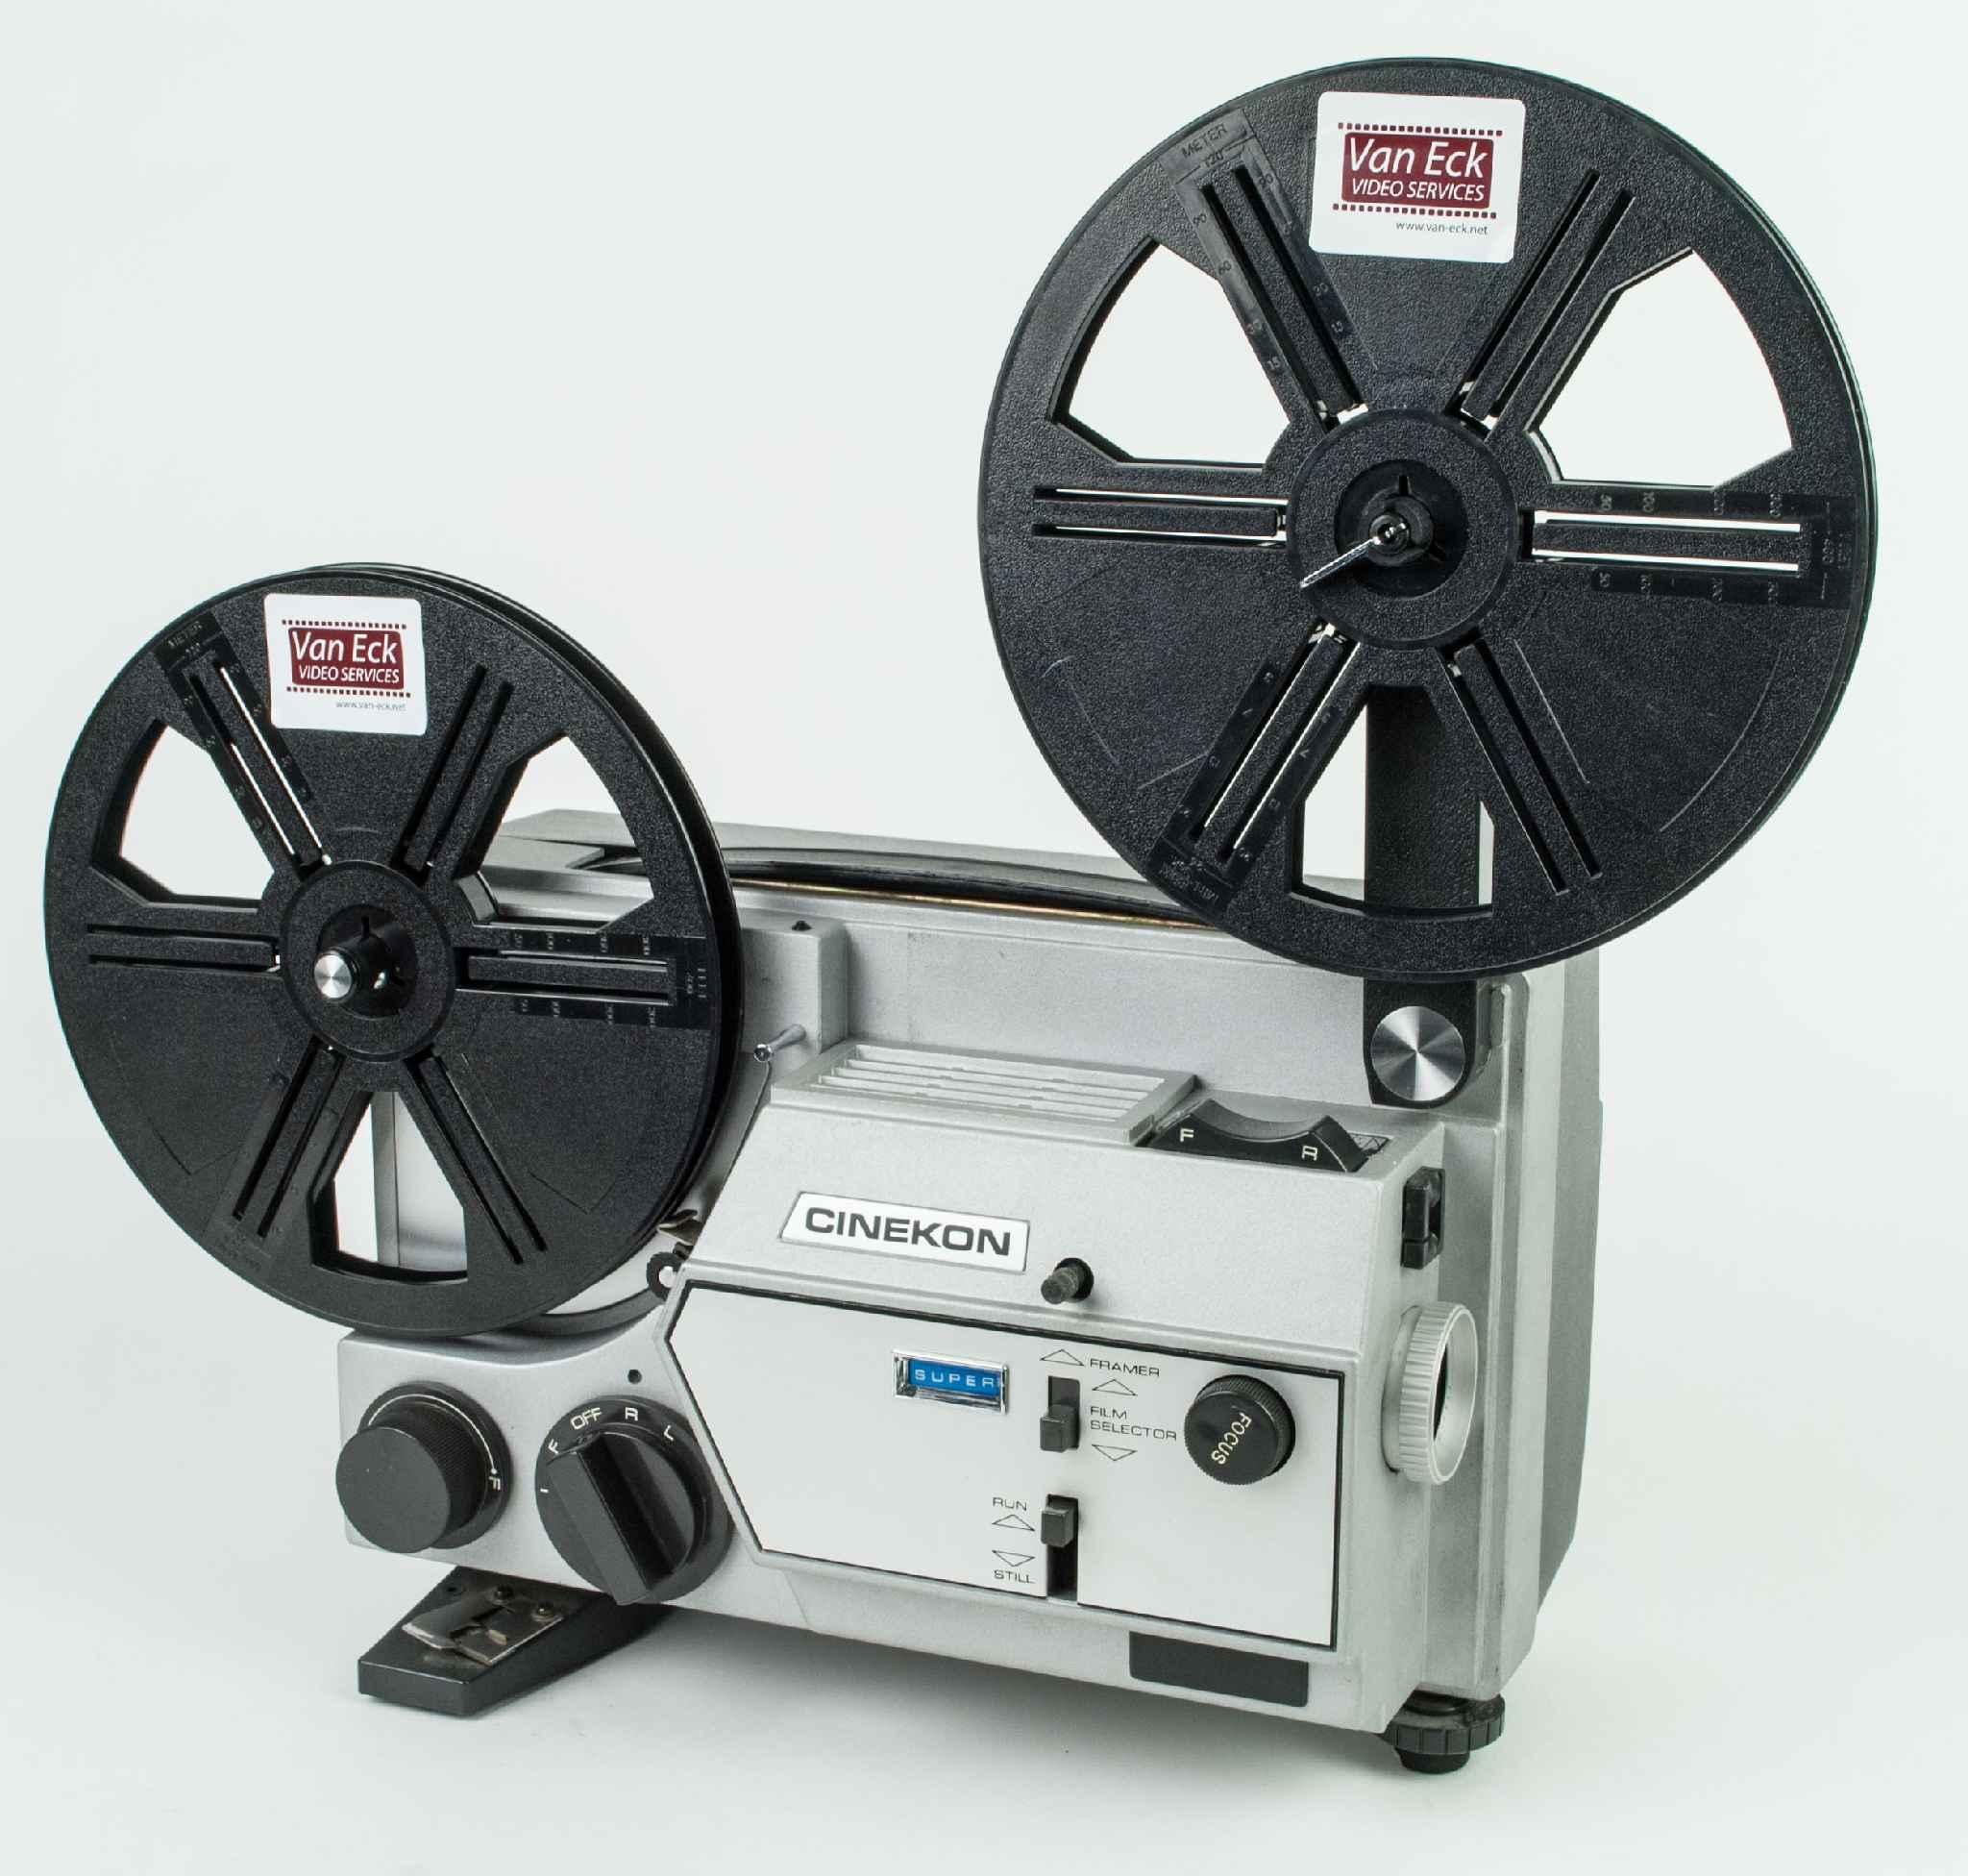 Cinekon Instduo IQS, Film Projectors - Spare Parts and